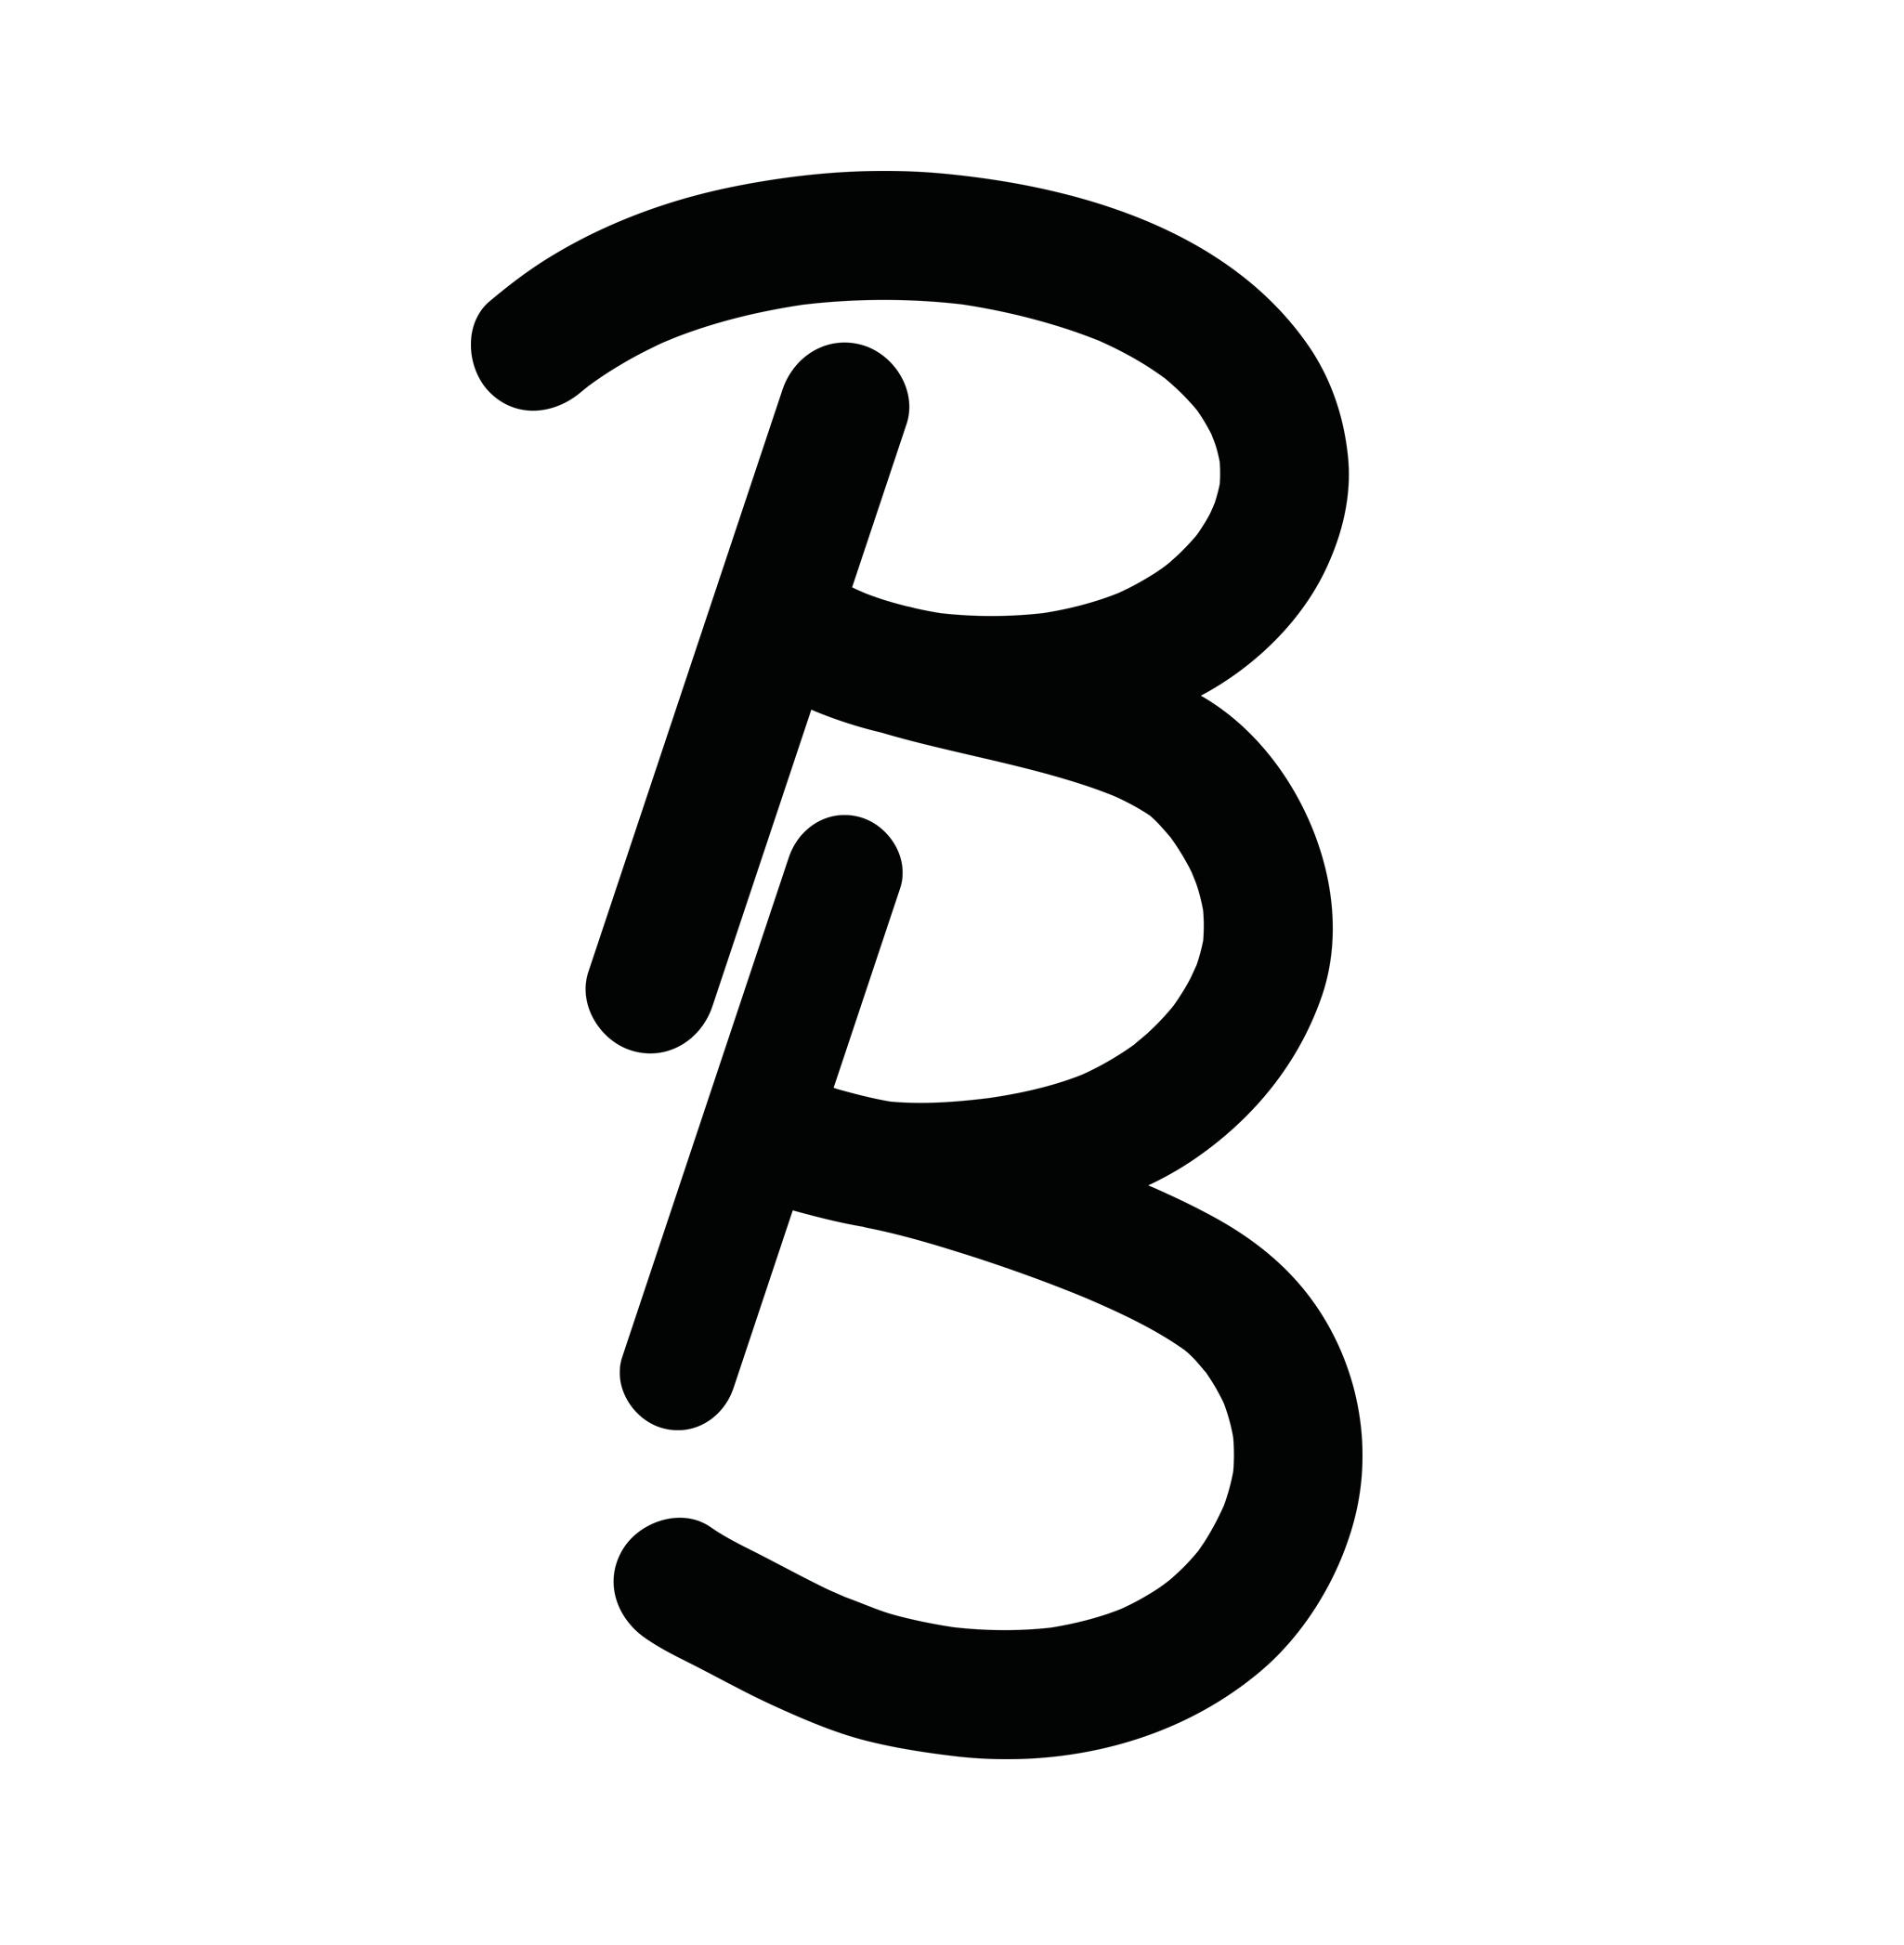 Bb logo the bridal bar pinterest bb logos and logo for Bb logo